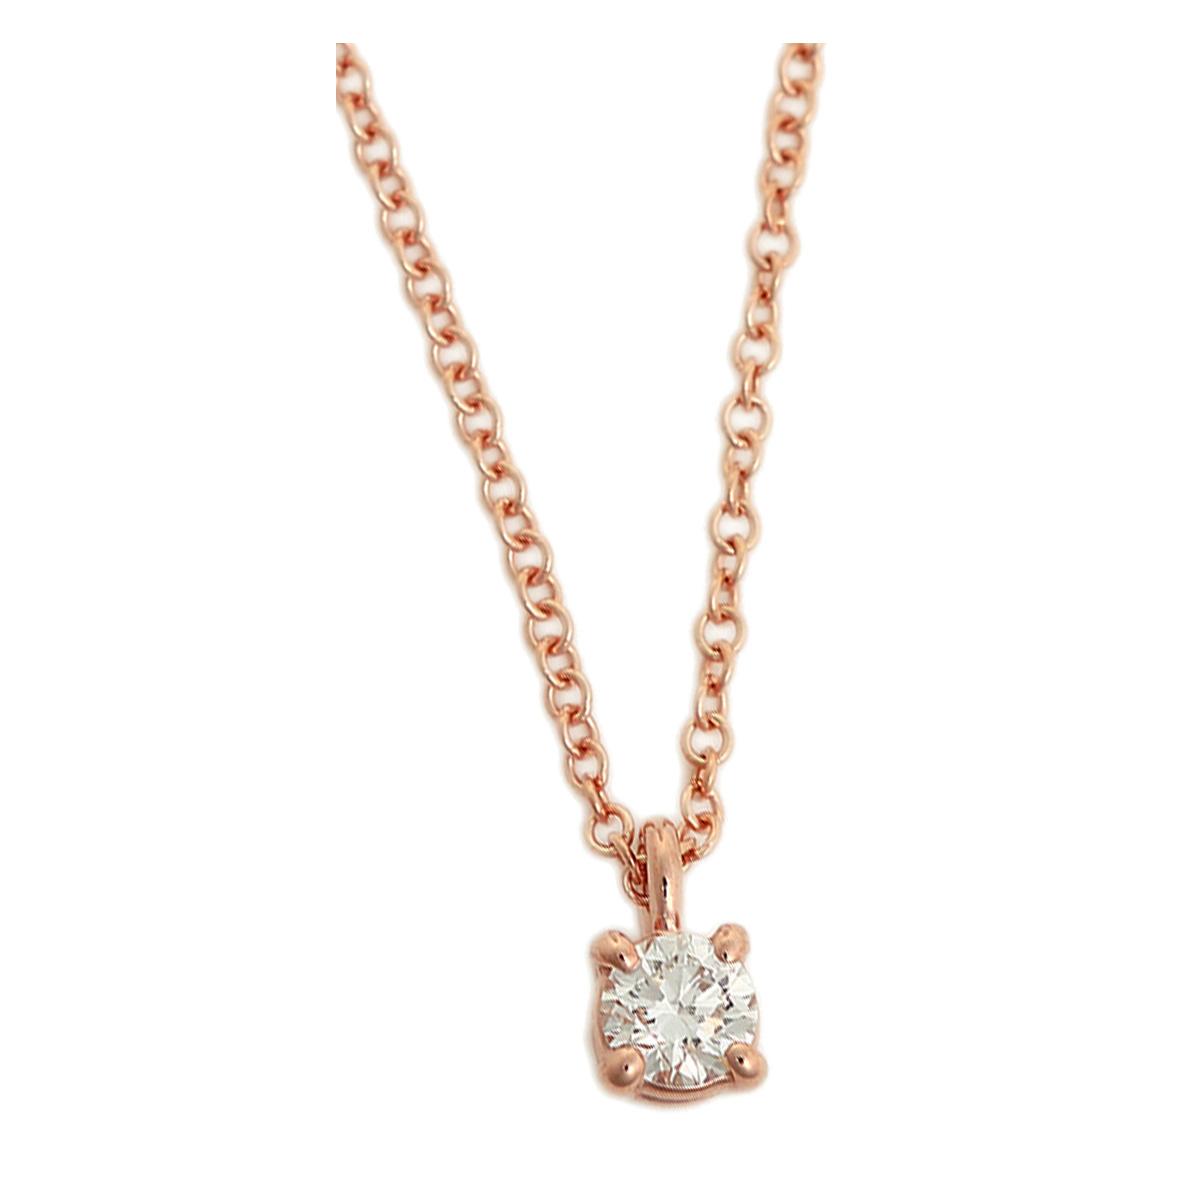 Salada bowl rakuten global market tiffany necklace single tiffany necklace single diamond tiffany ampco solitaire diamond pendant12ct 16 in aloadofball Image collections